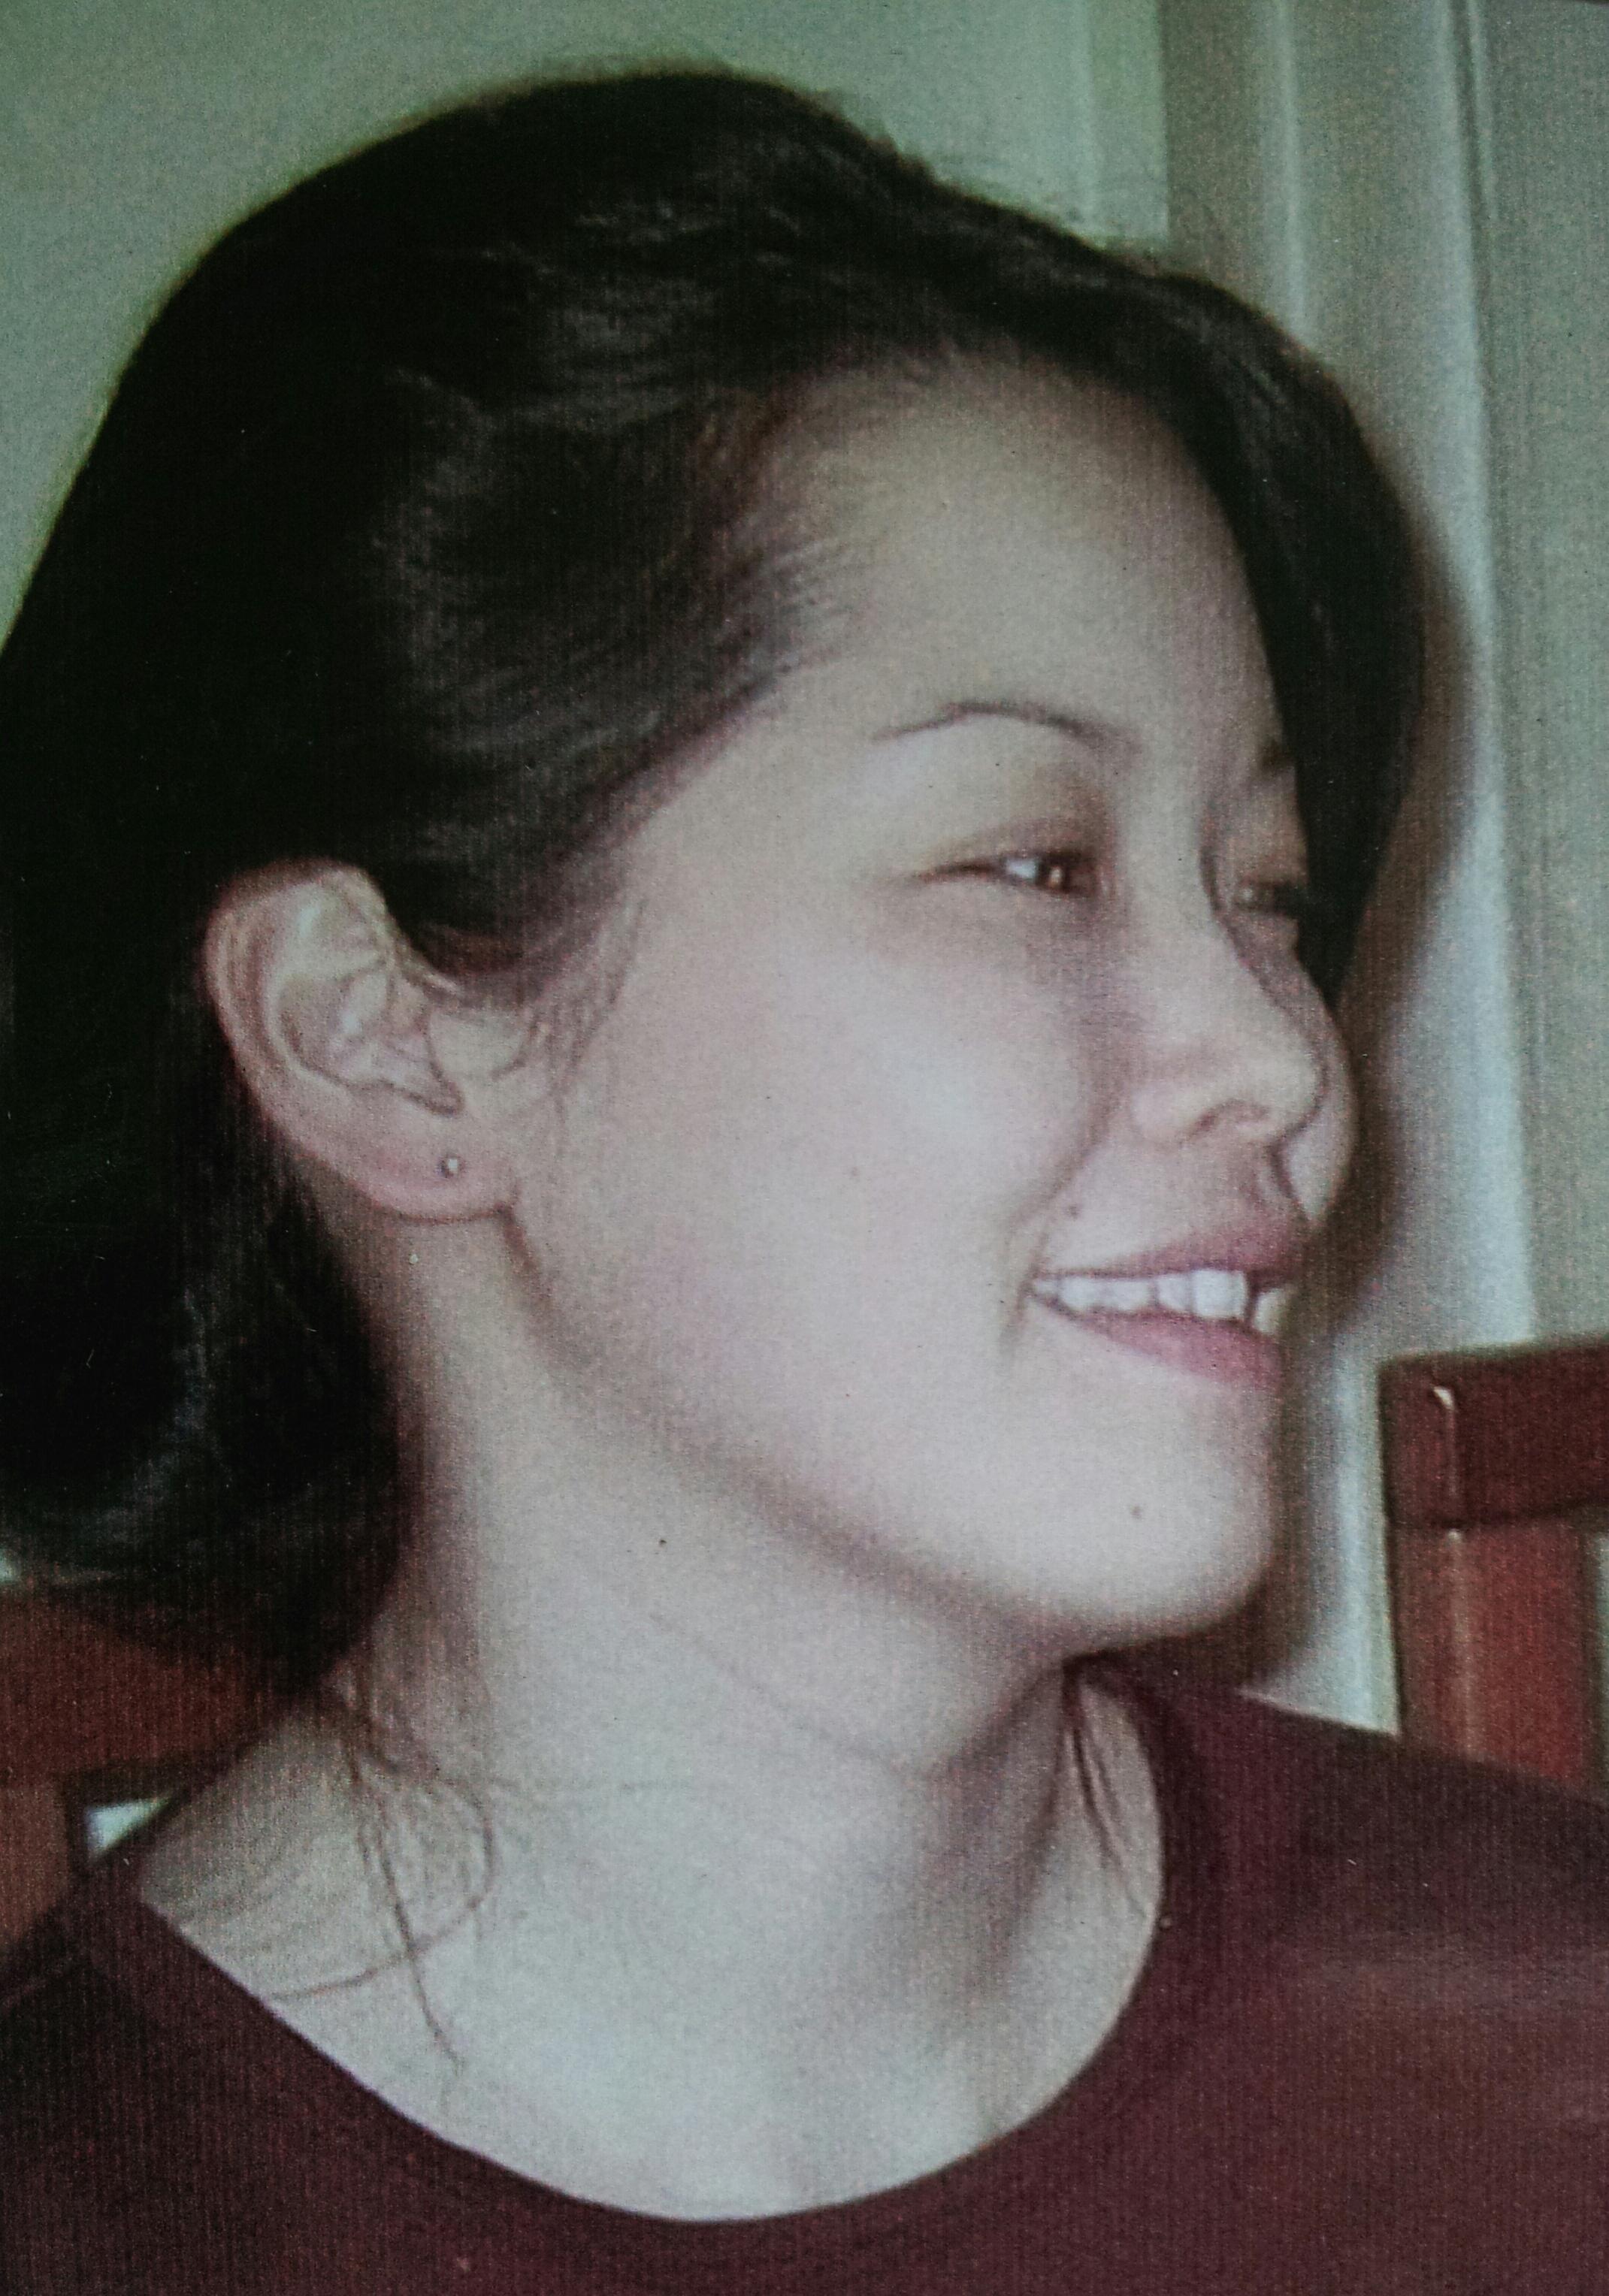 Eunpa Chae